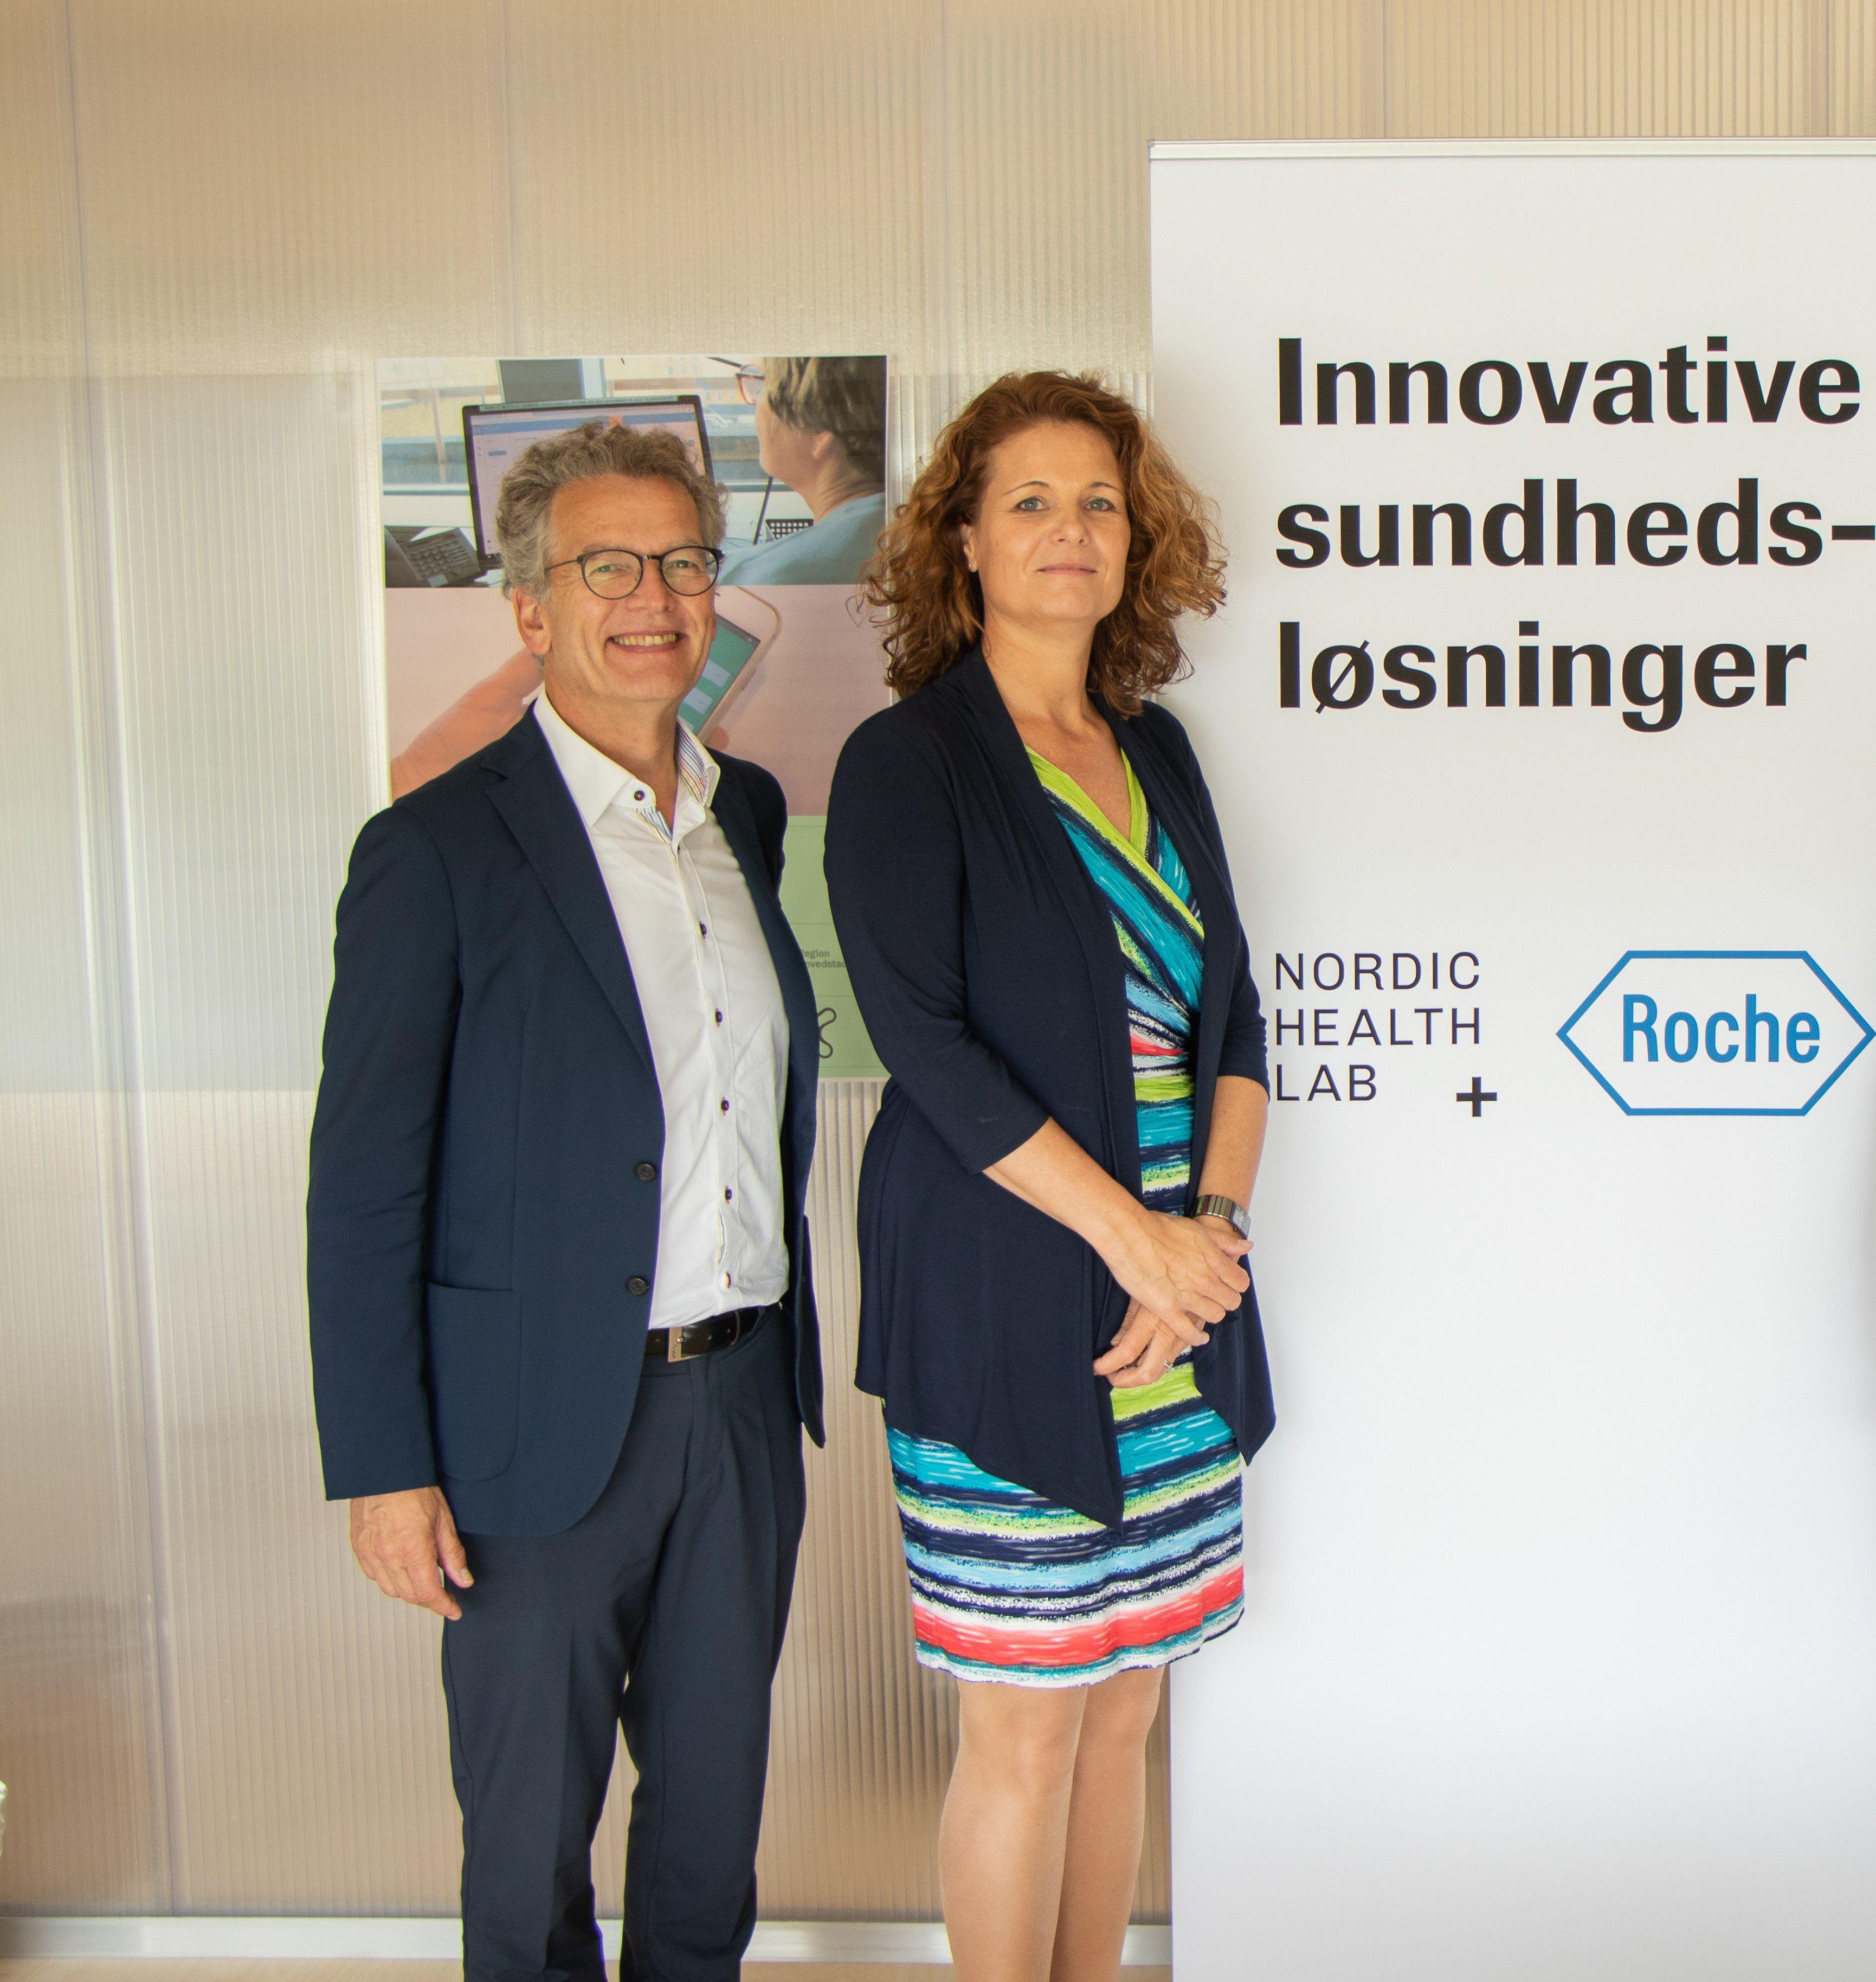 Esther de Rooij and Harald Borrmann